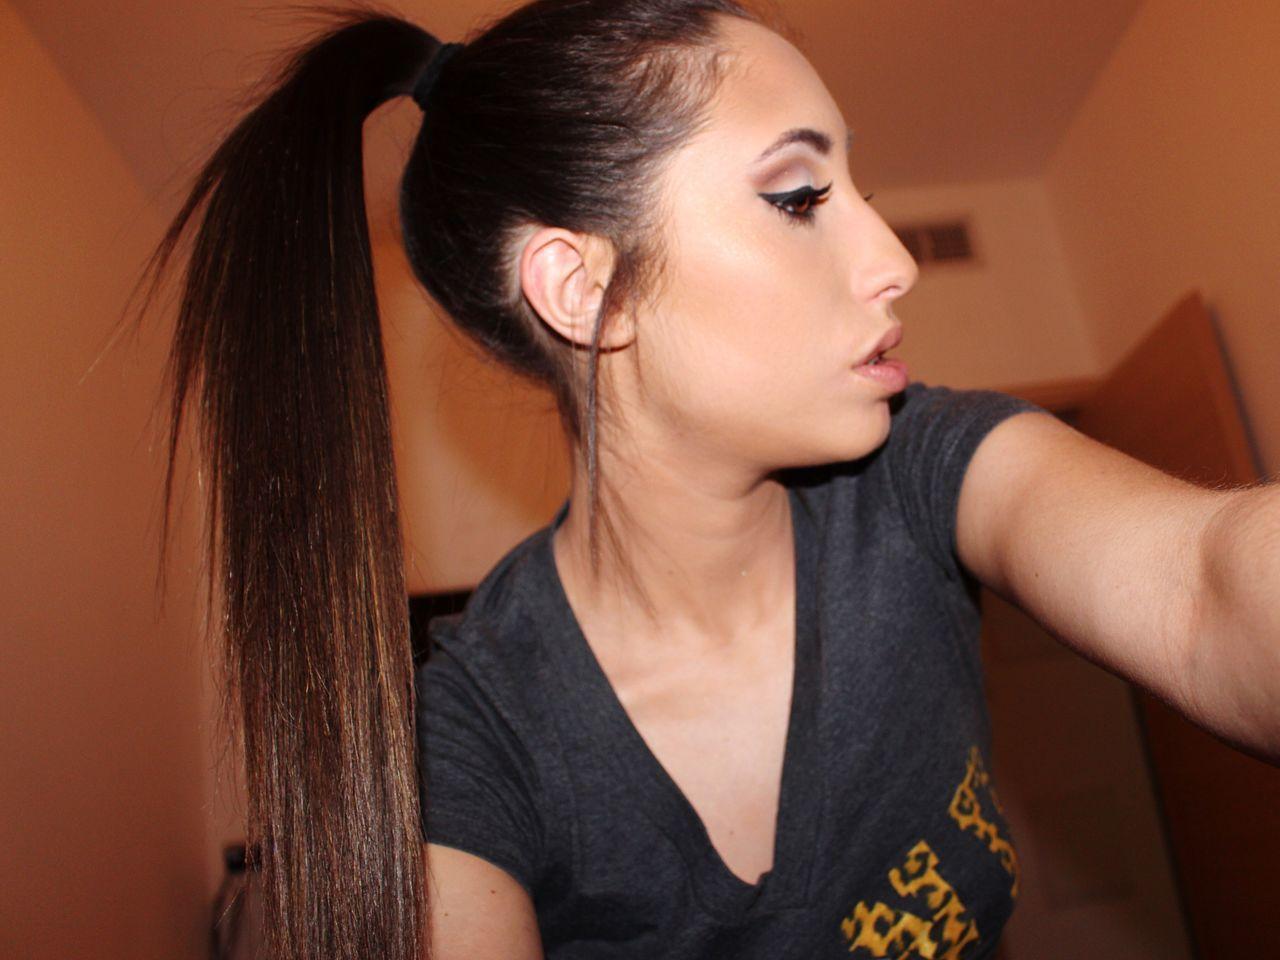 Beautiful stock photos of prinzessin, headshot, long hair, beauty, beautiful woman